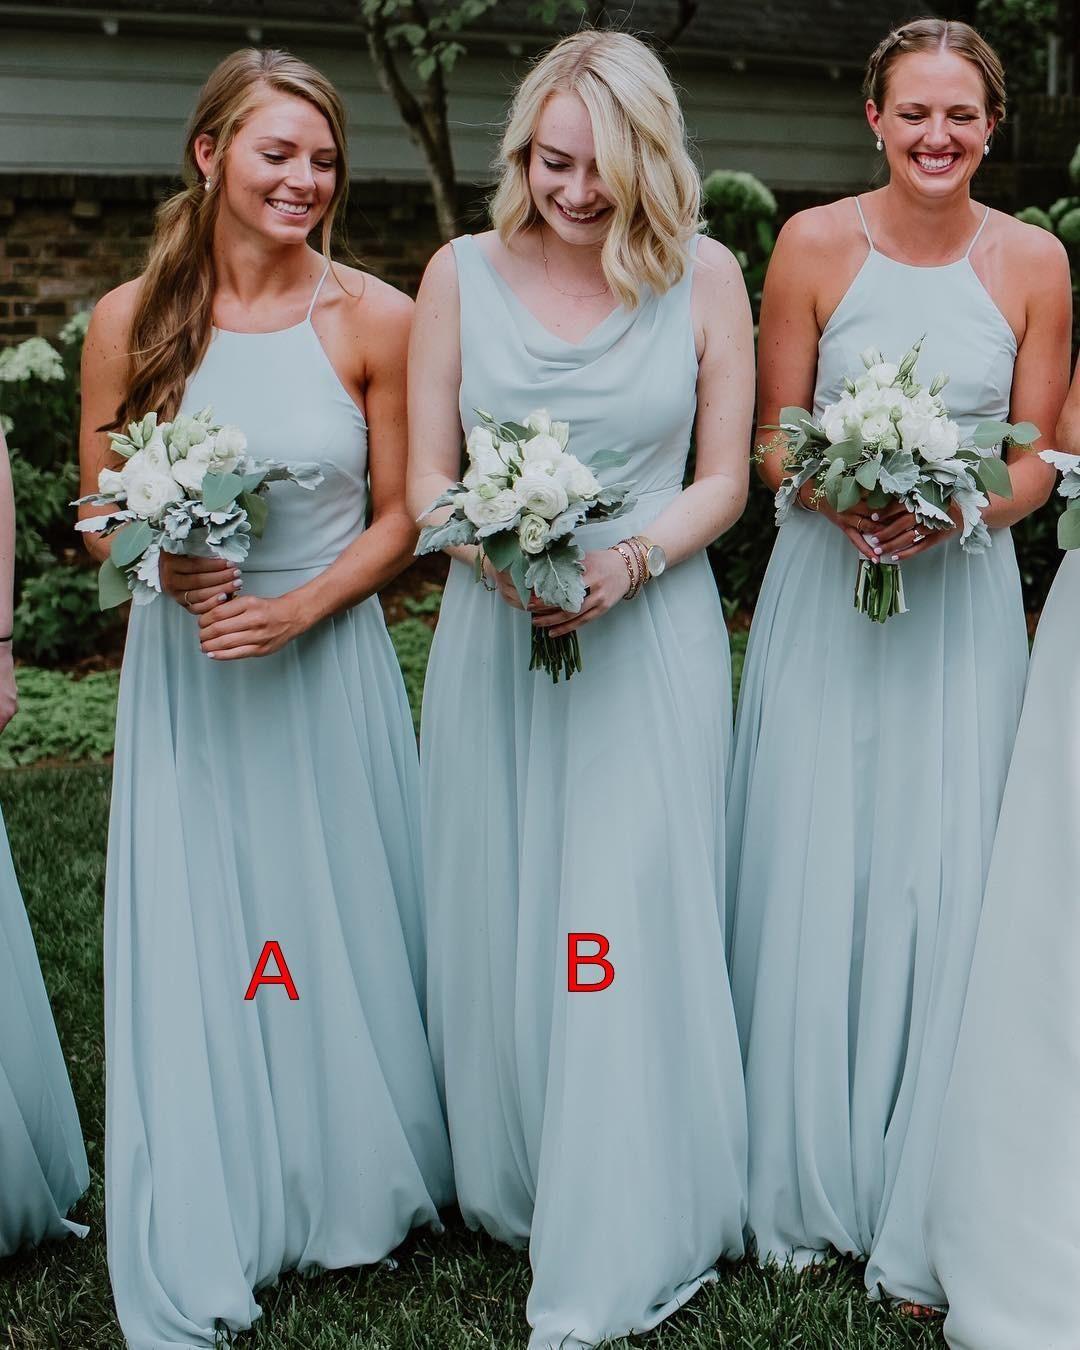 Cheap Simple Mint Green A Line Bridesmaid Dresses Chiffon Pleats Wedding Guest Dress Maid of Honor Gowns abiti da damigella d'onore